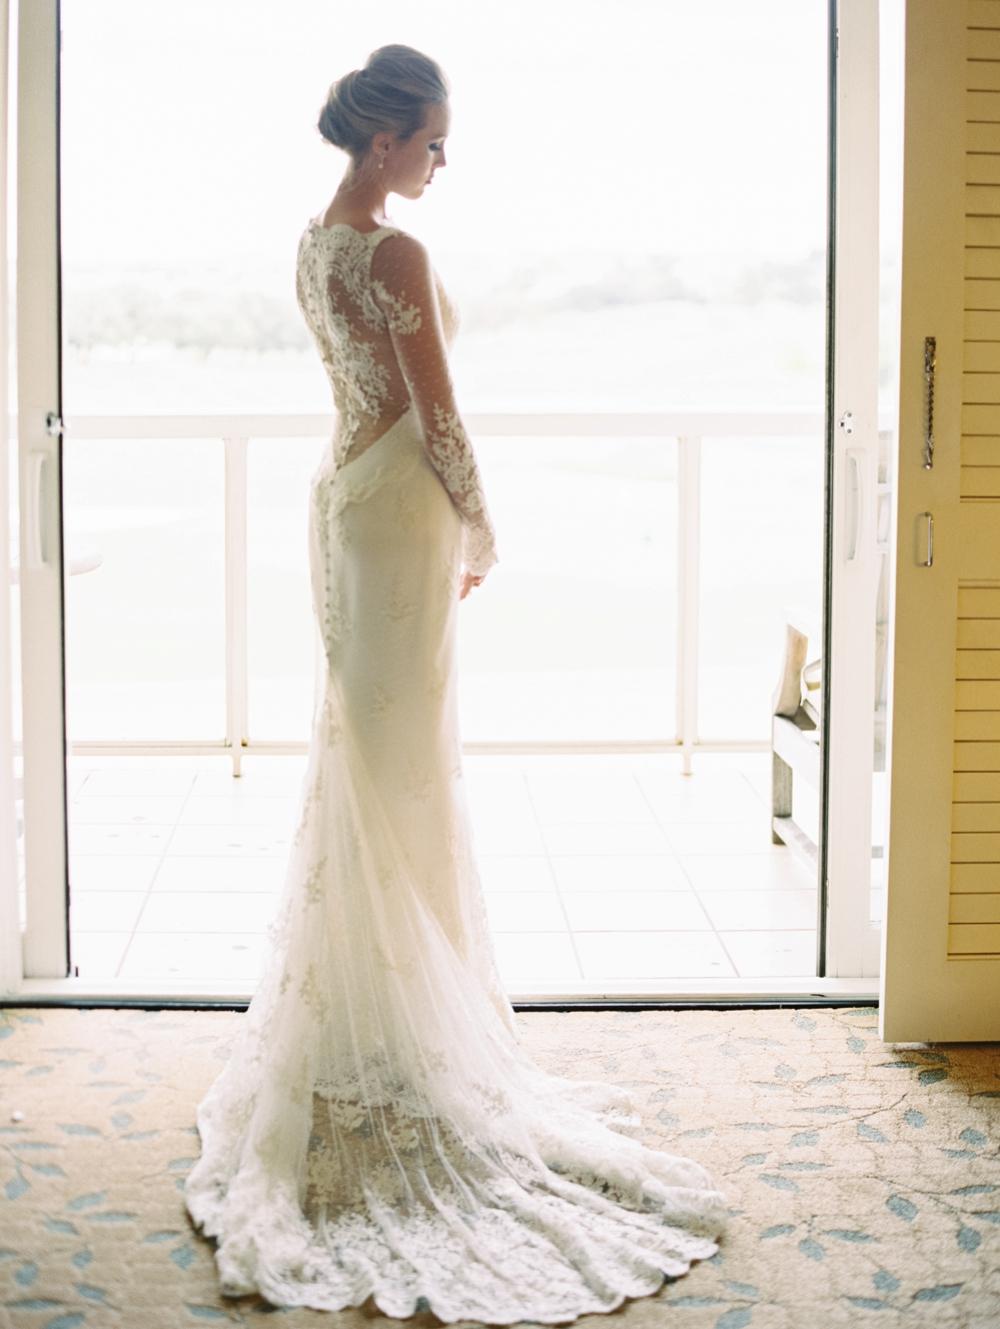 Dallas Wedding Planner Lindsey Zamora